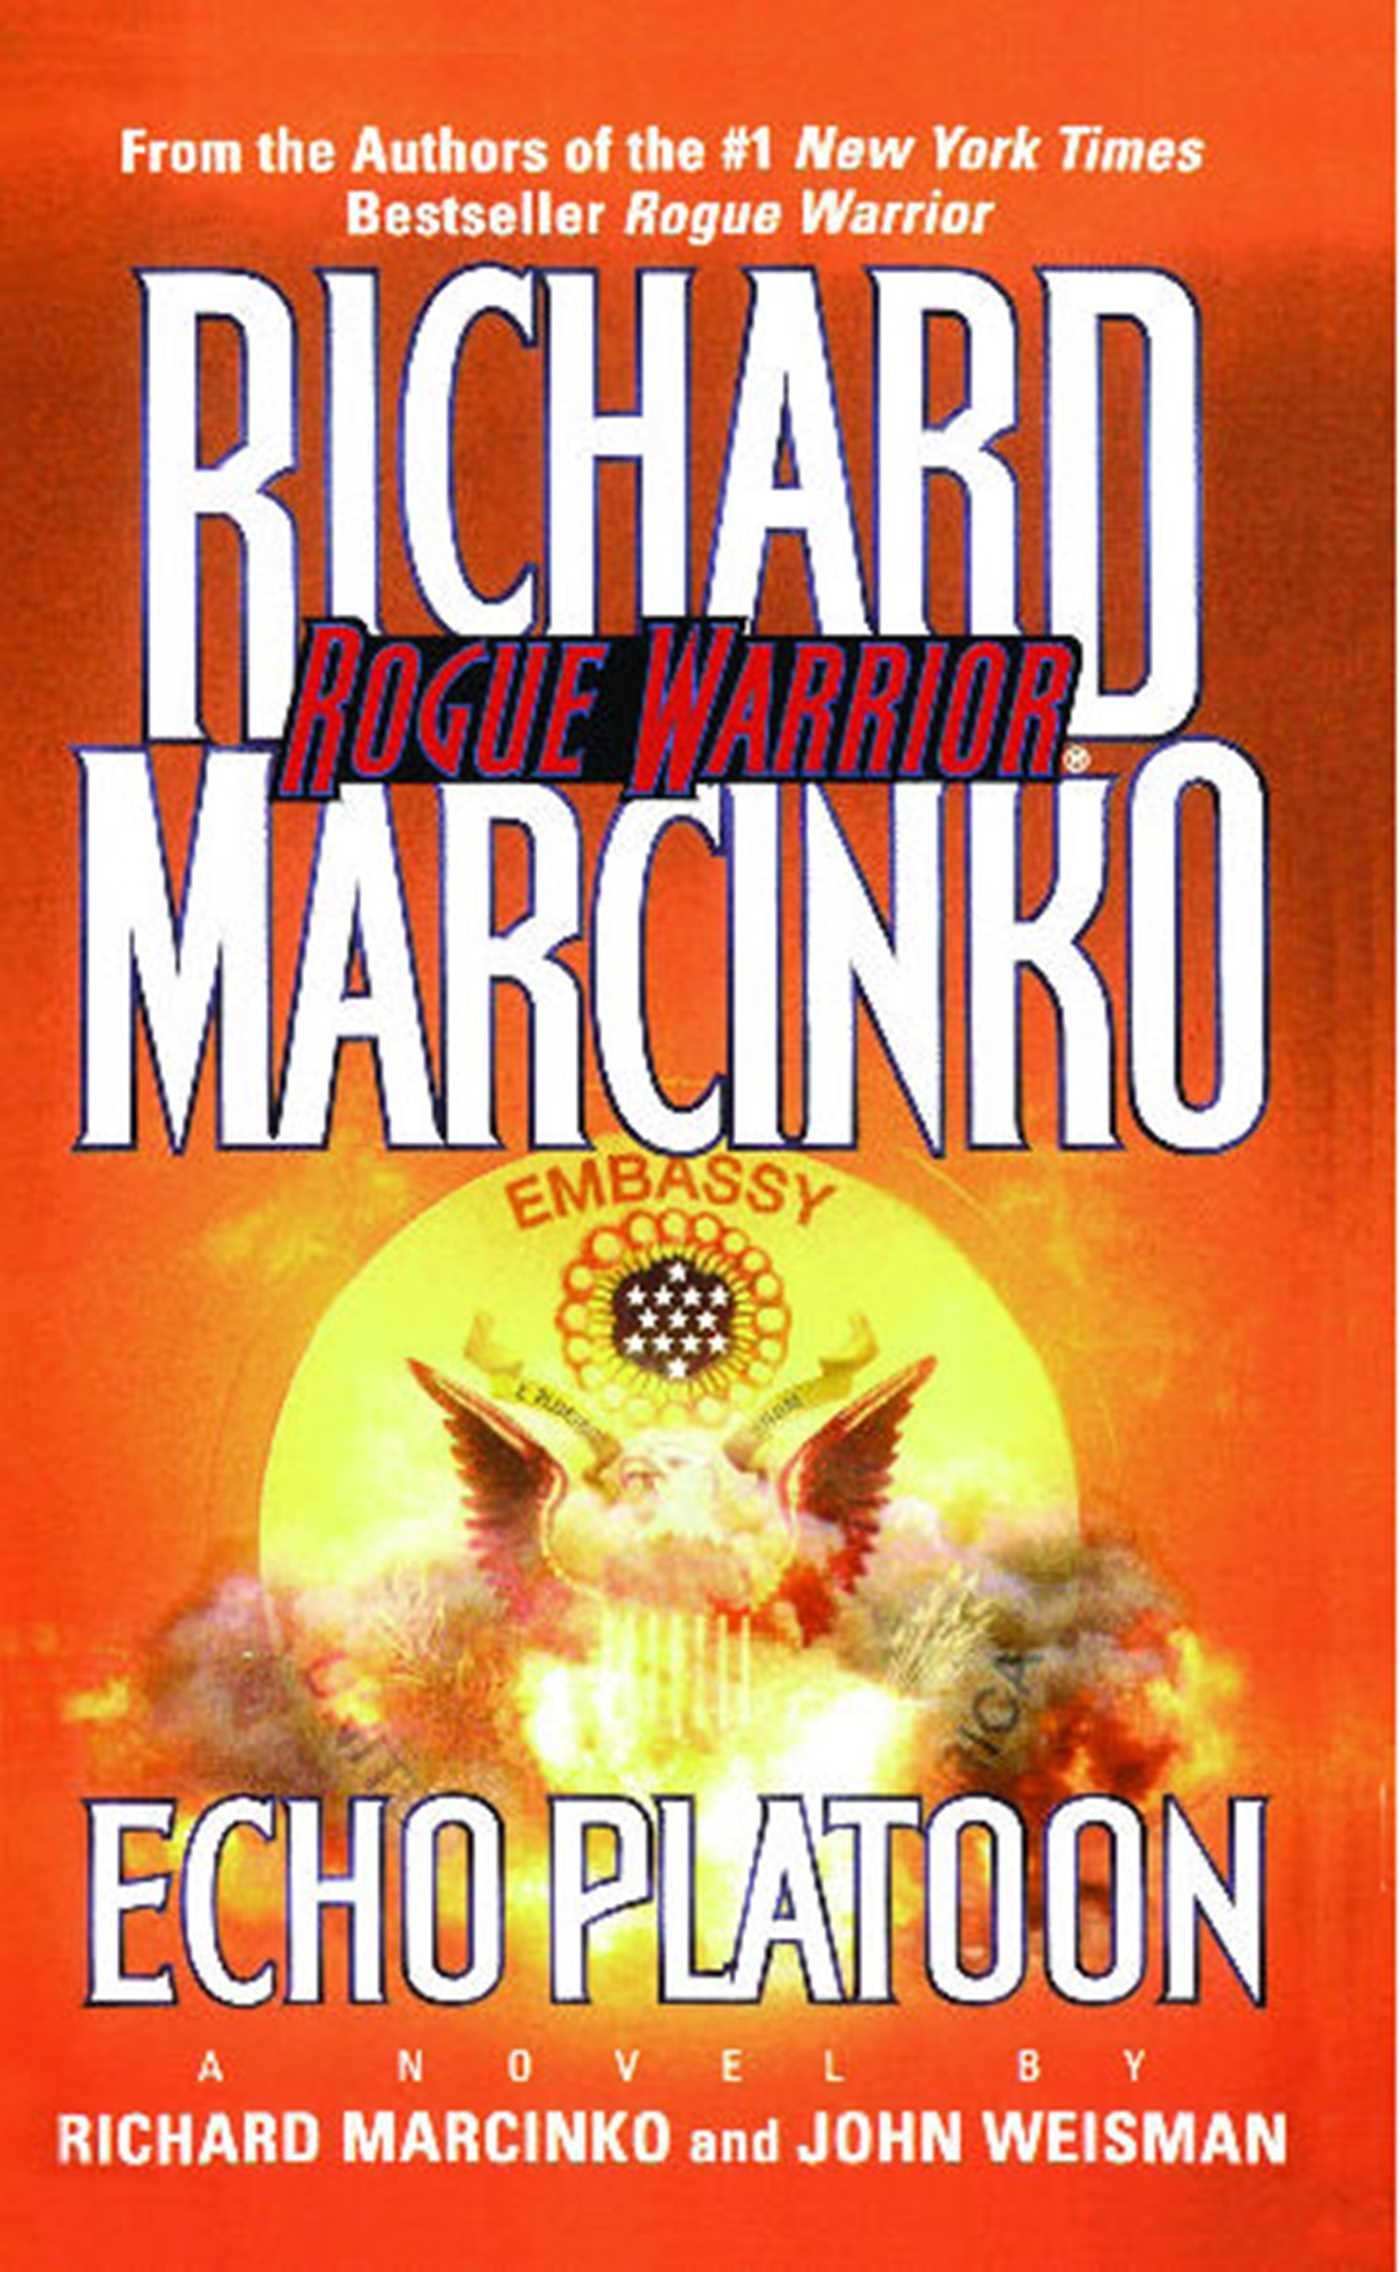 Echo Platoon Ebook By Richard Marcinko John Weisman Official Lt Pro High Definition Perfect Foundation 30 Ml 9781439140956 Hr